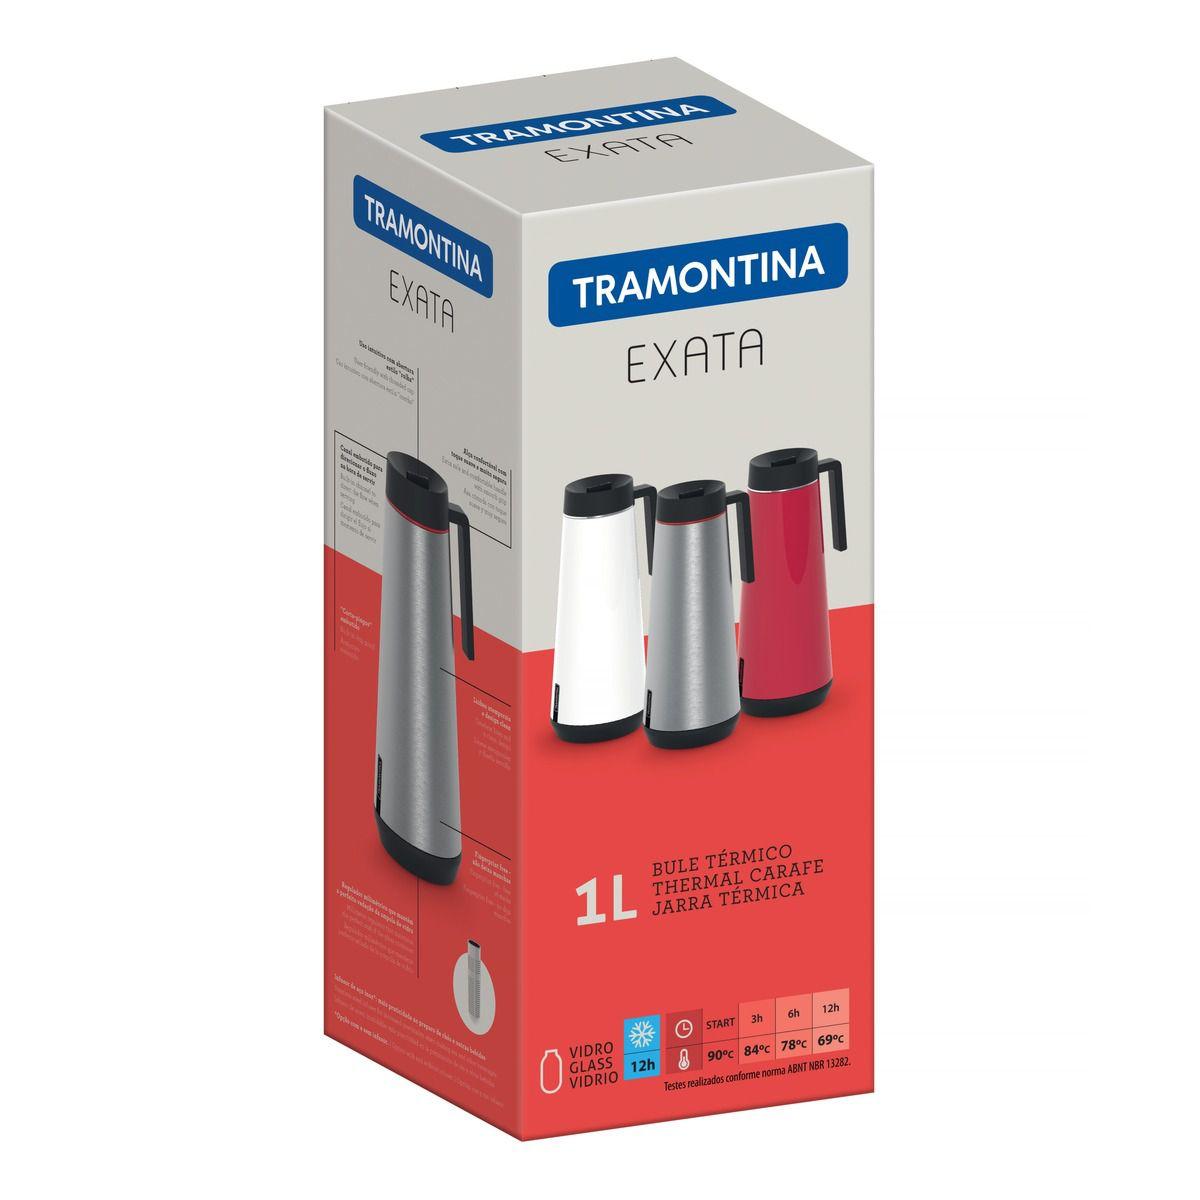 Bule Térmico Tramontina Exata em Aço Inox 1L 61645100